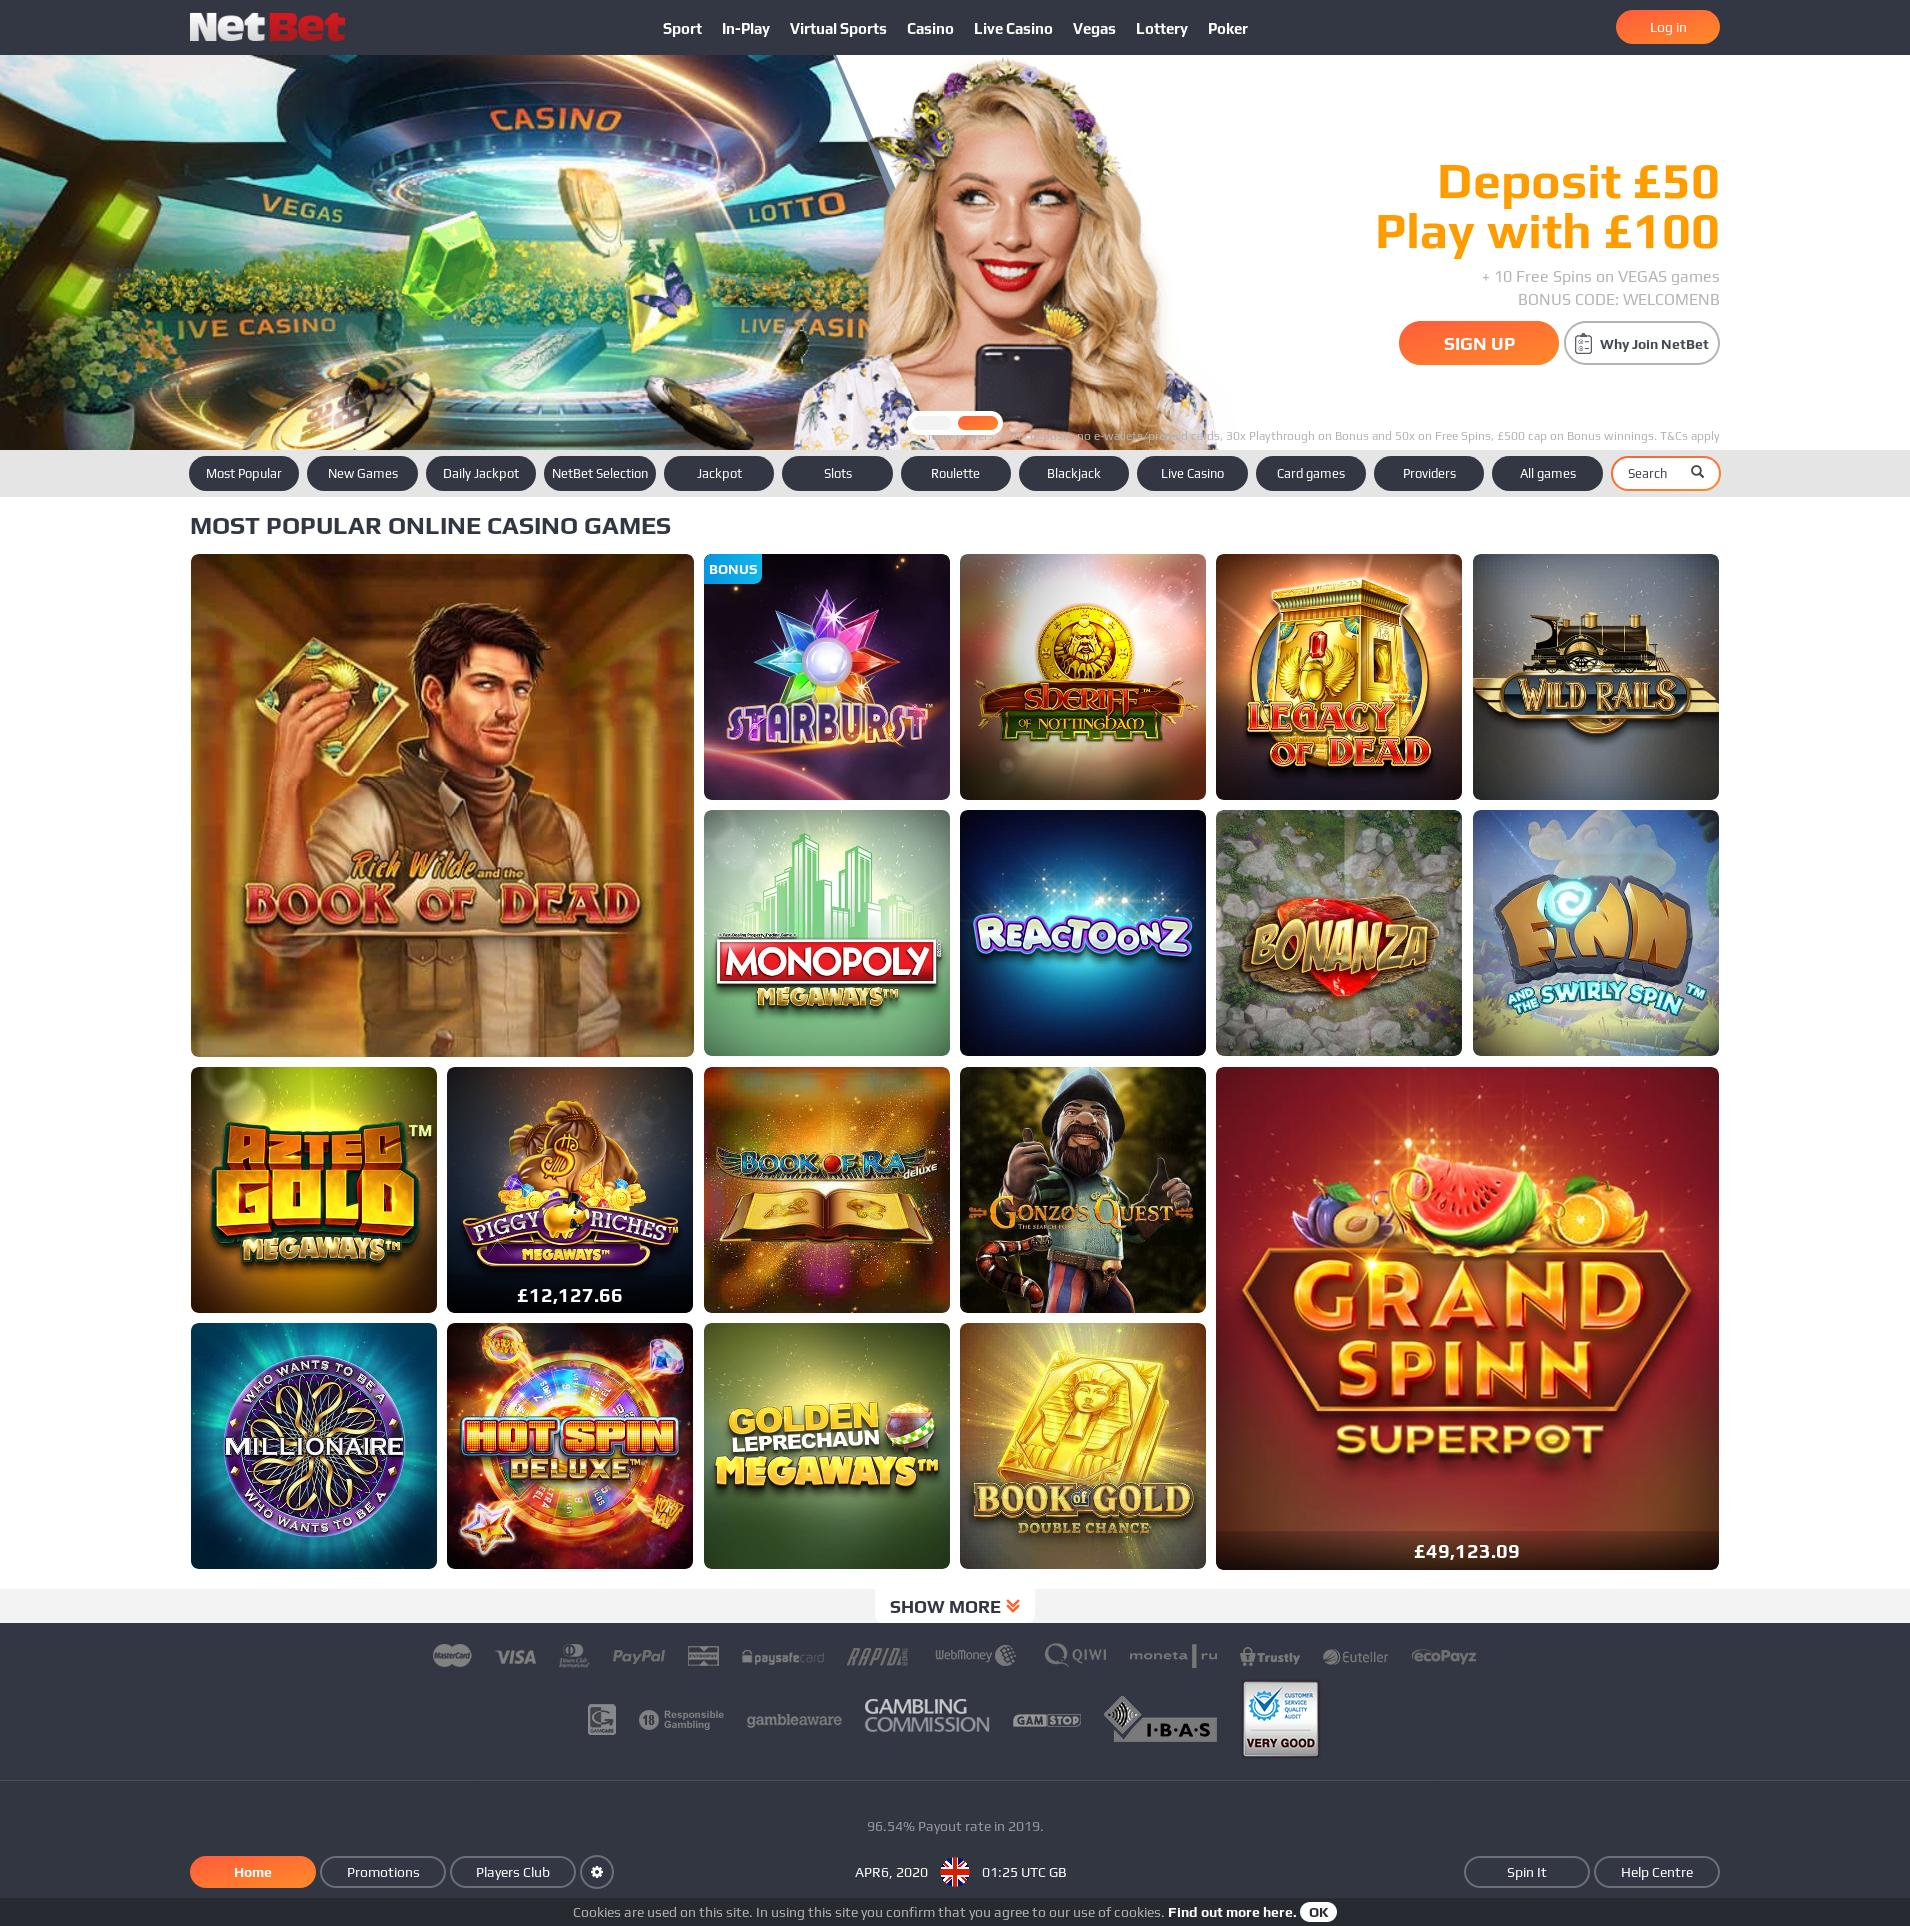 Casino screen Lobby 2020-04-06 for United Kingdom